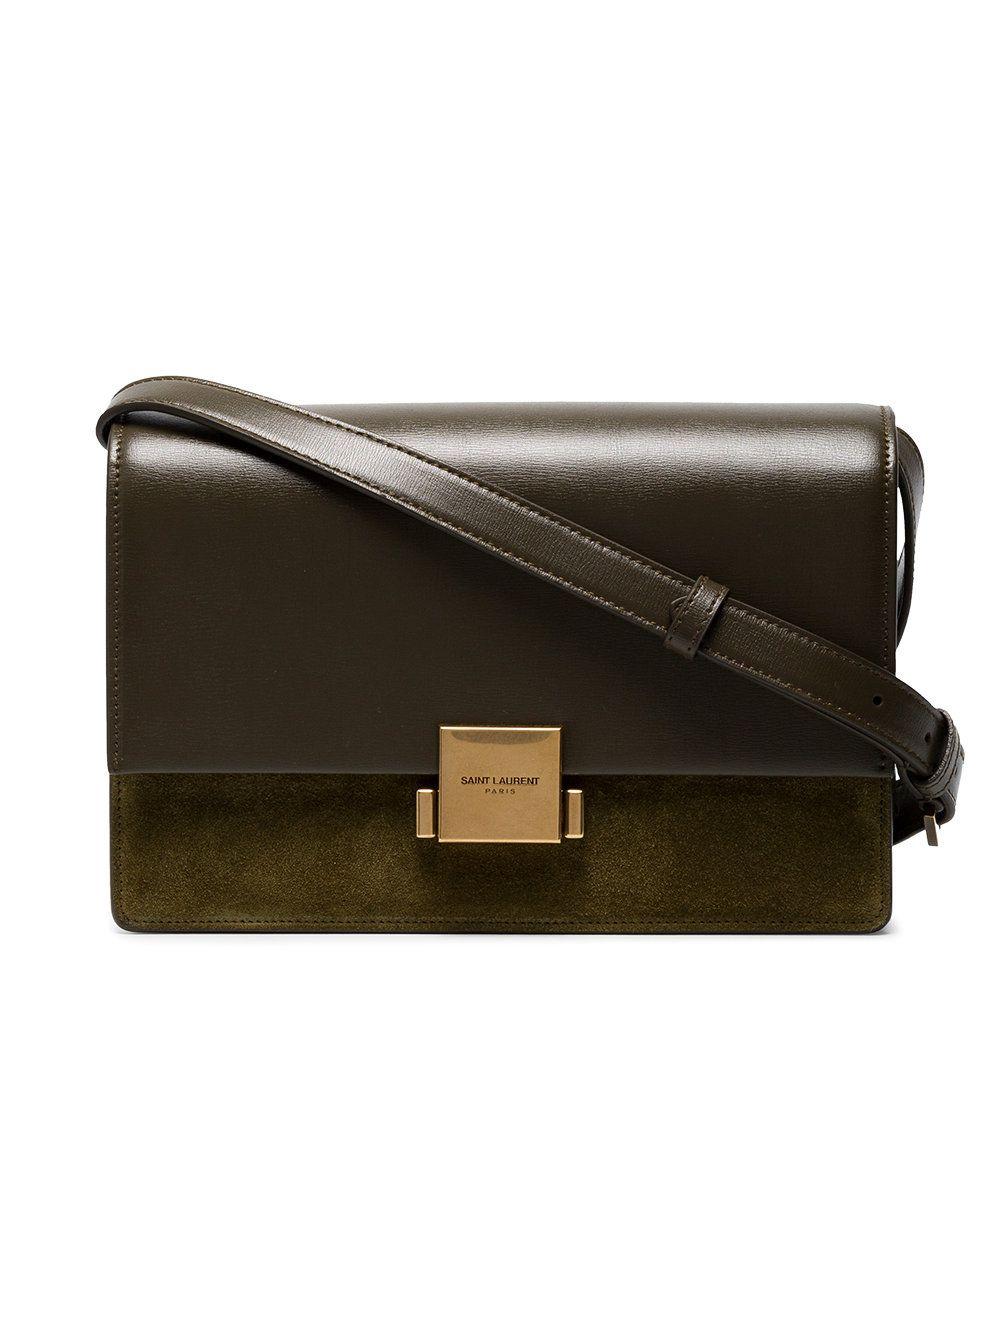 Saint Laurent Green Bellechasse Medium Suede And Leather Satchel ... b73ec527a6df7